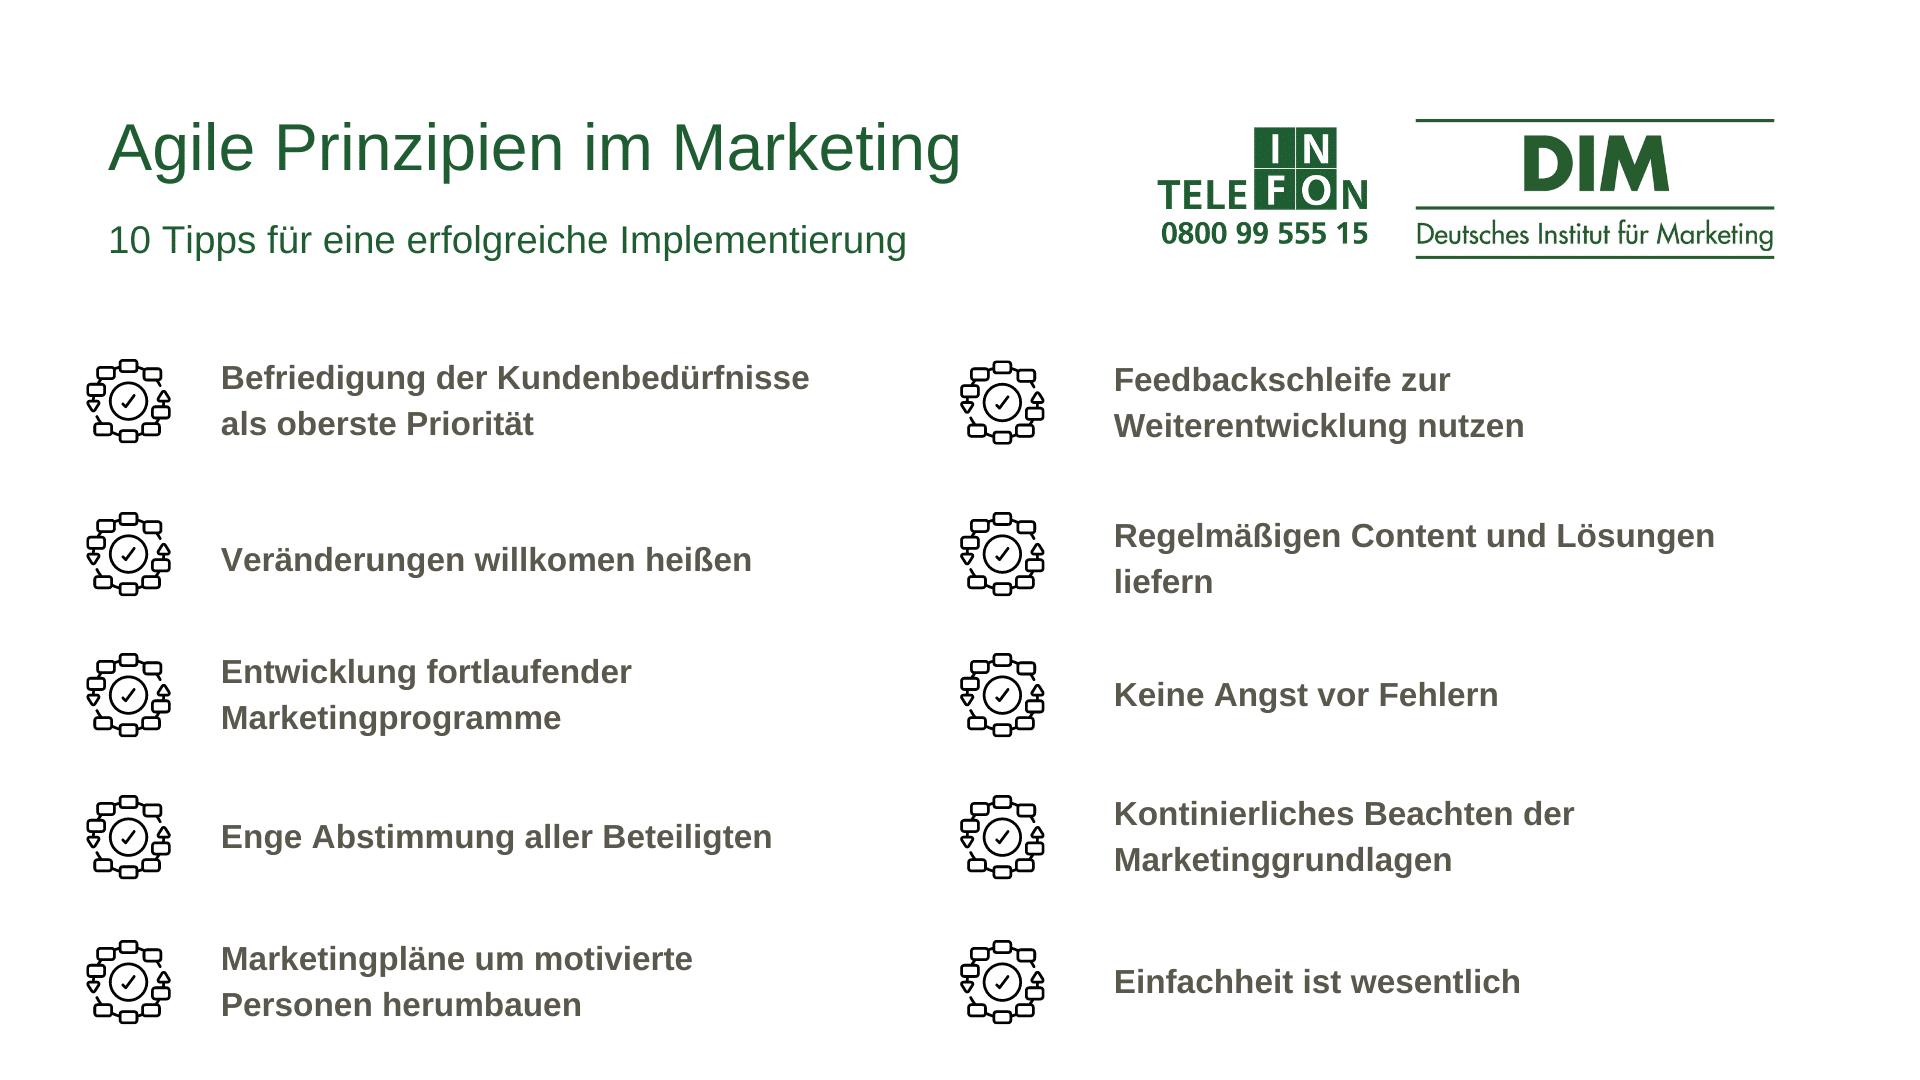 Agile Prinzipien im Marketing